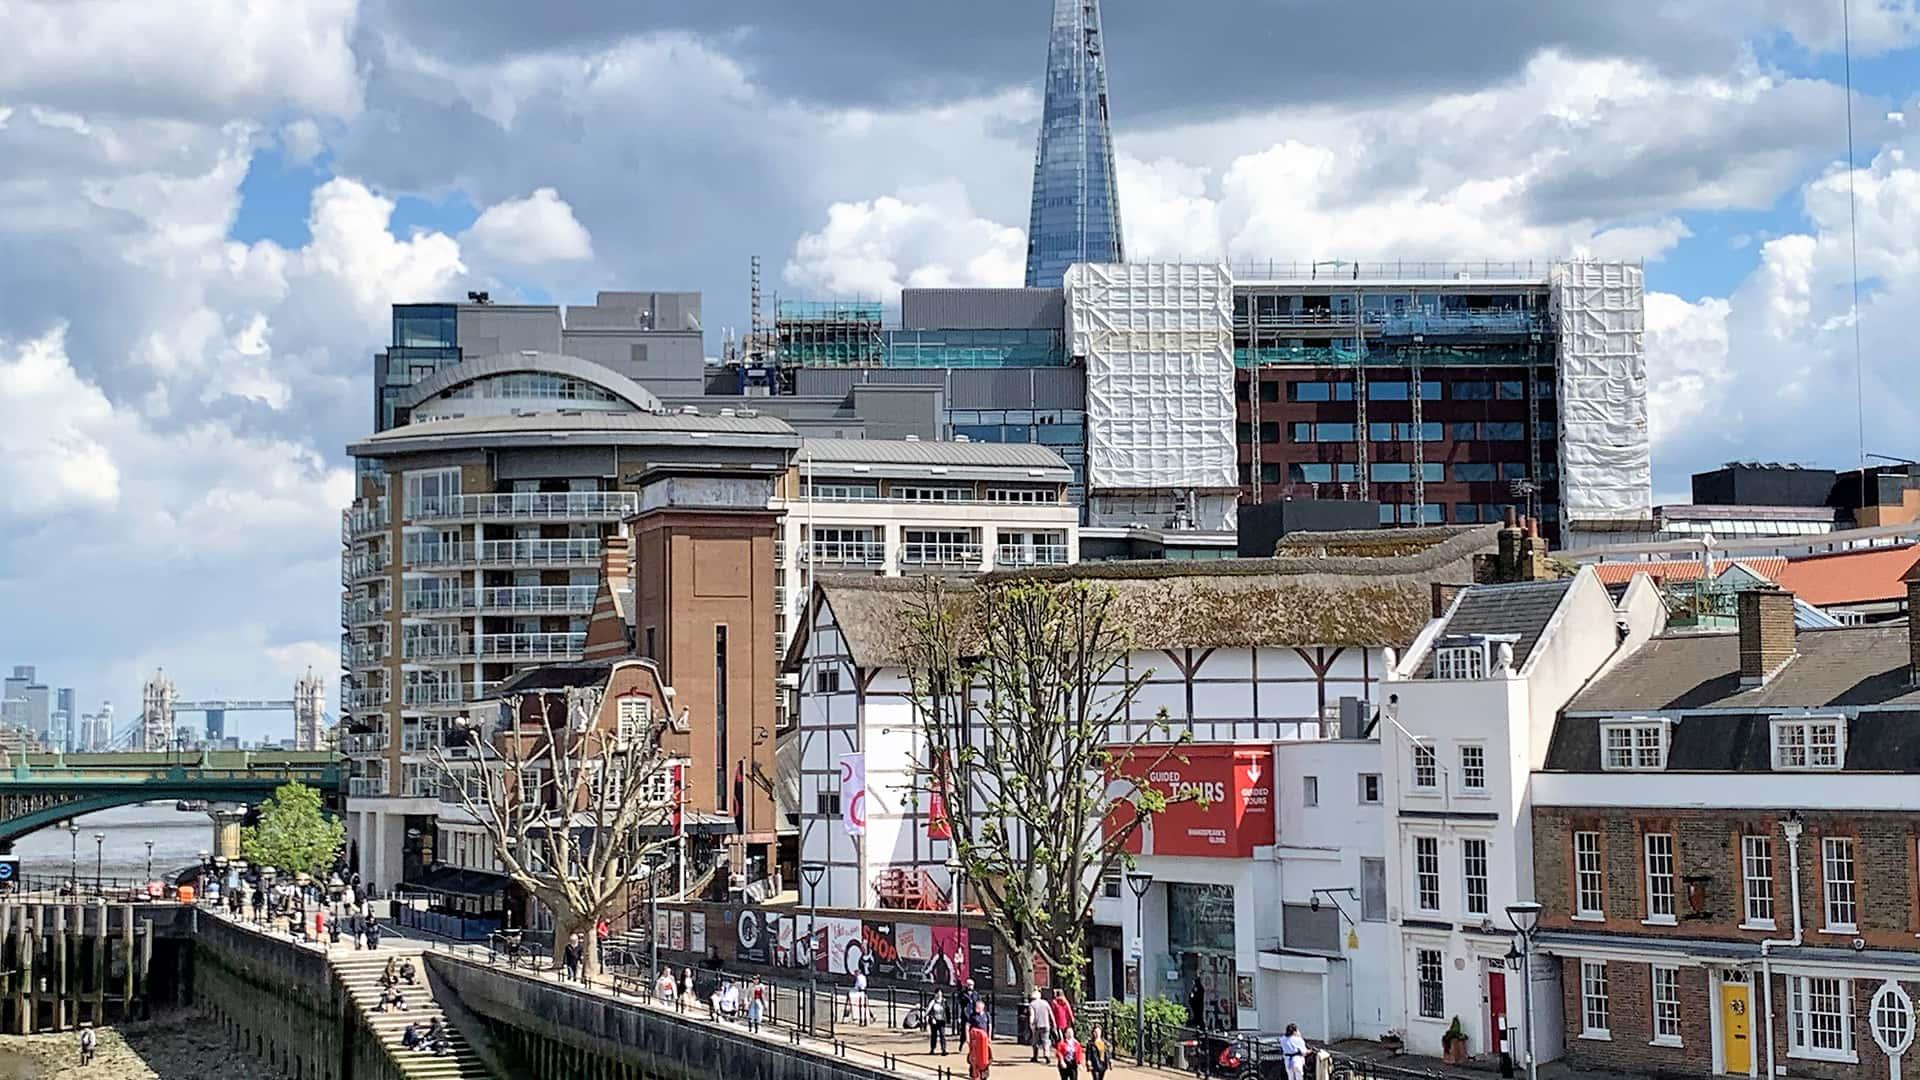 Historic London Tour – Beside the Thames